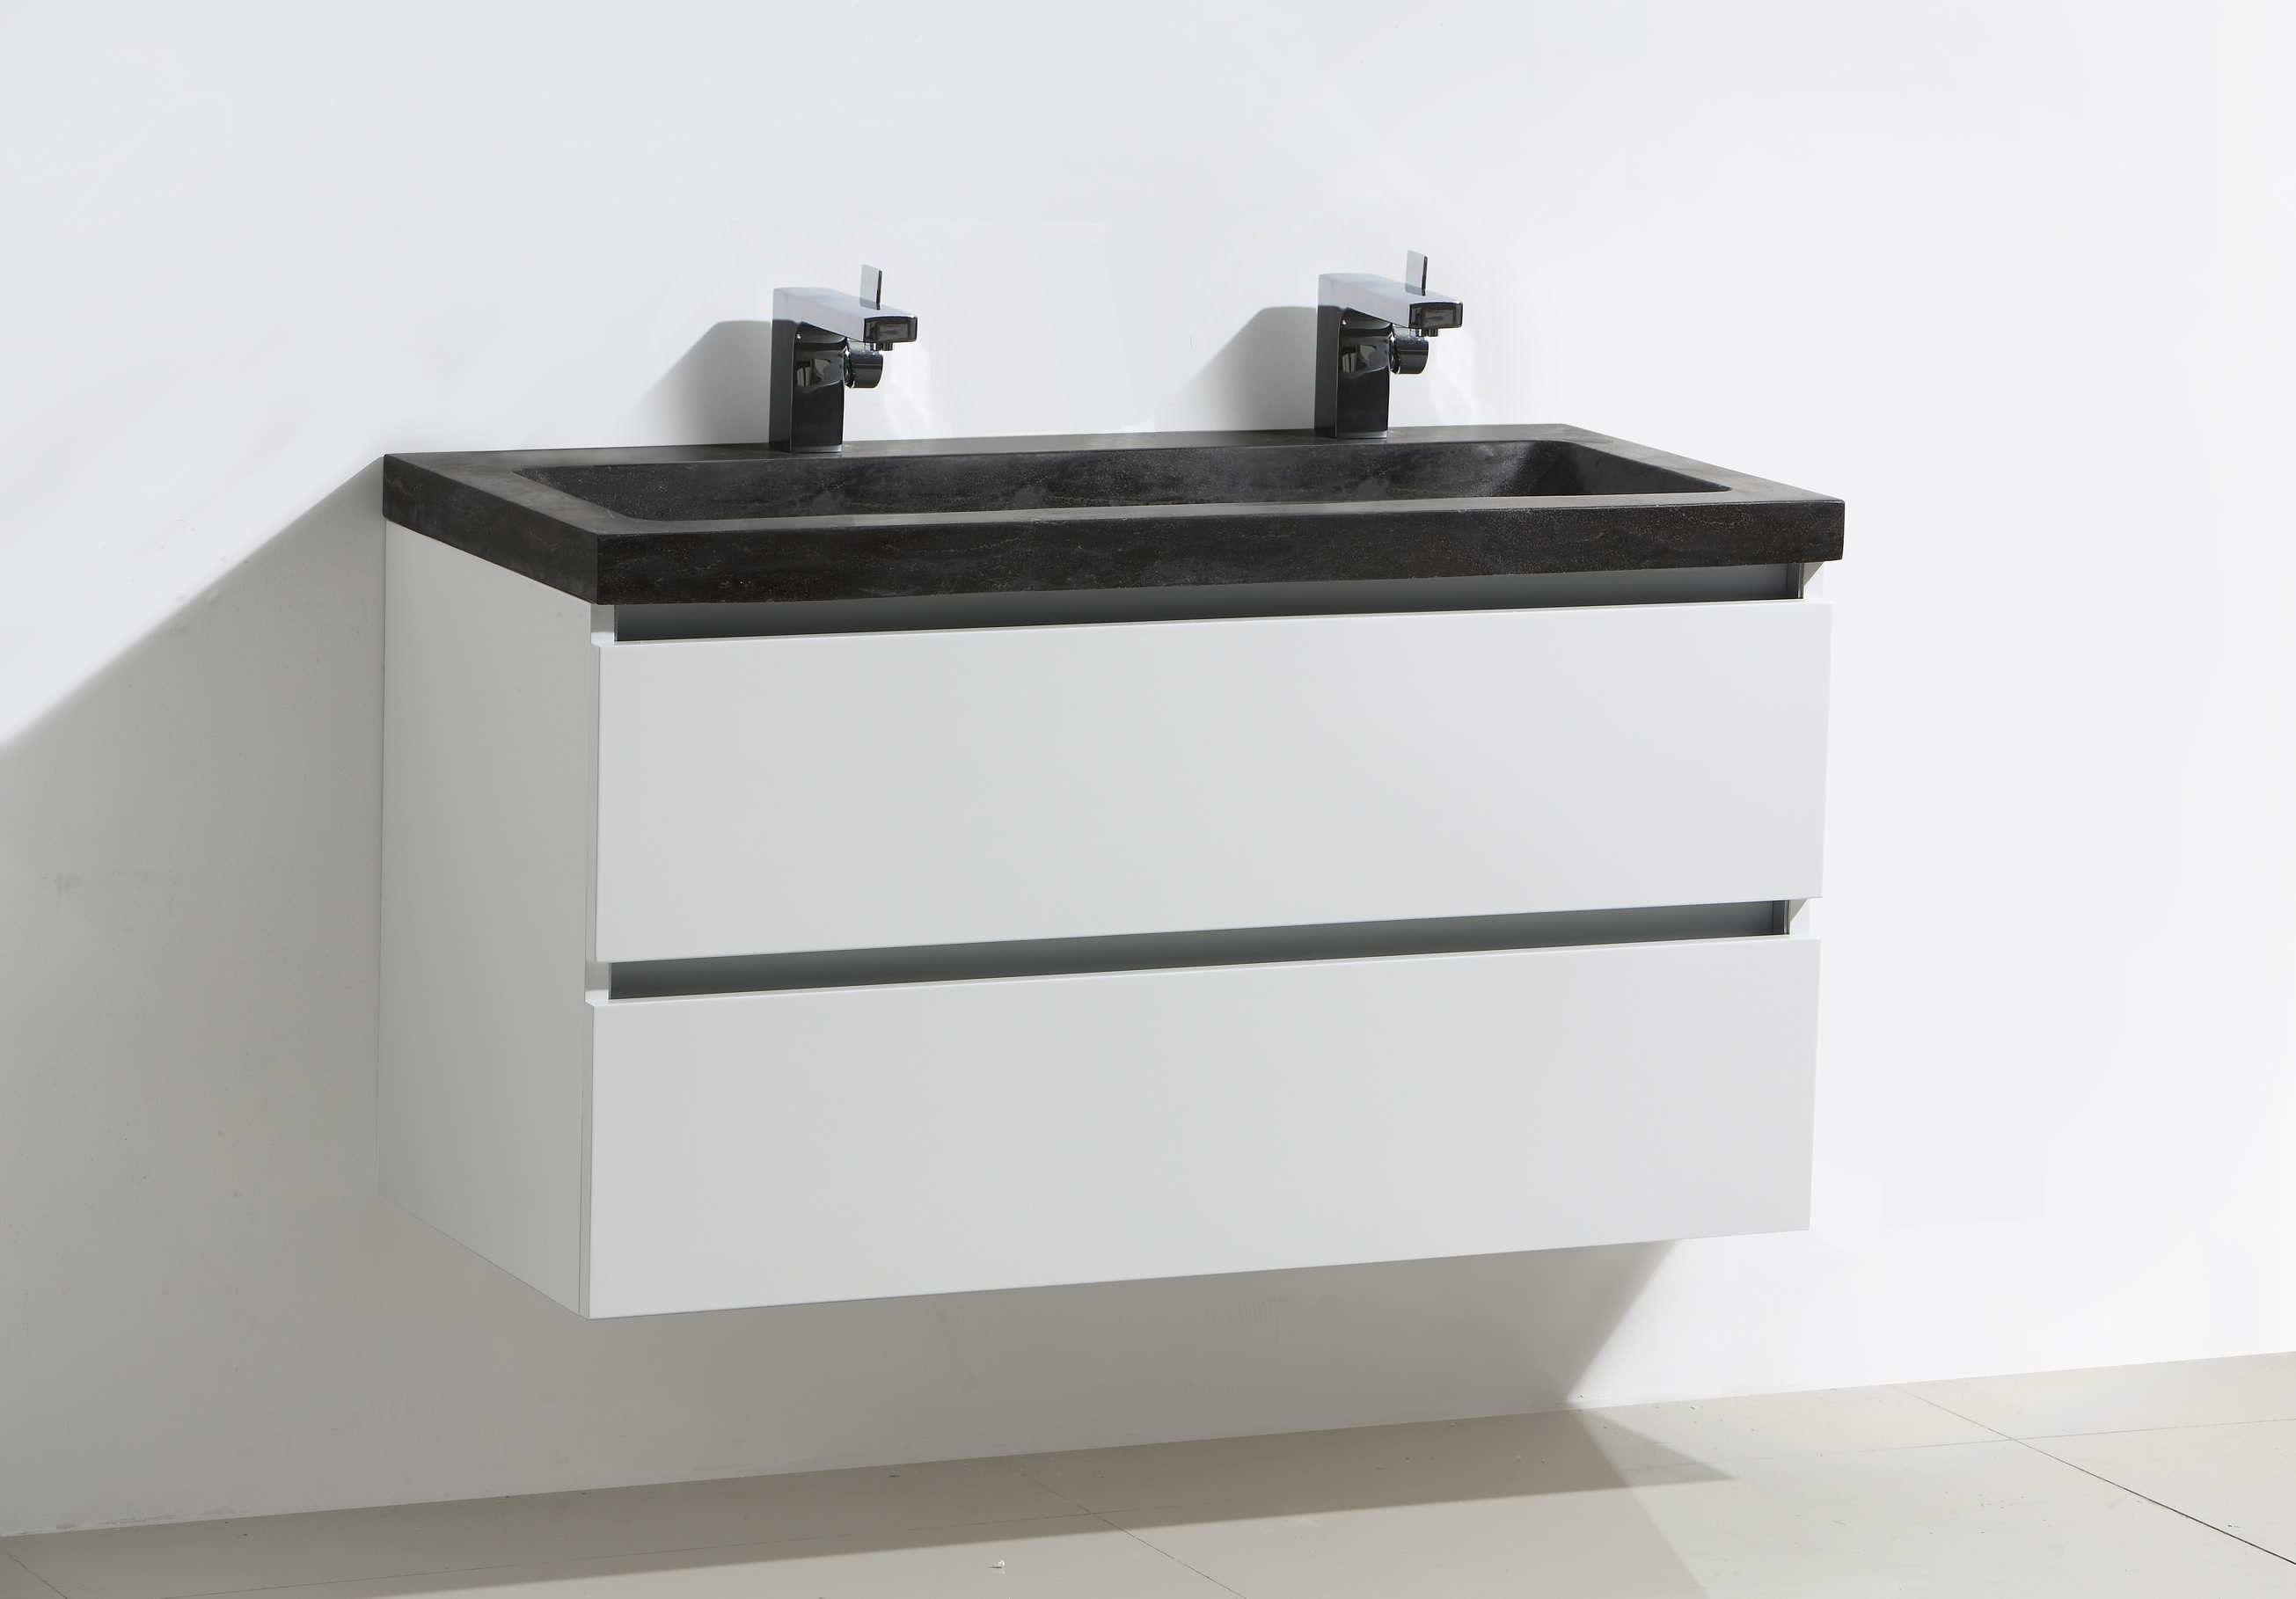 Lambini Designs Trend Stone badkamermeubel hoogglans wit 100cm, 2 kraangaten